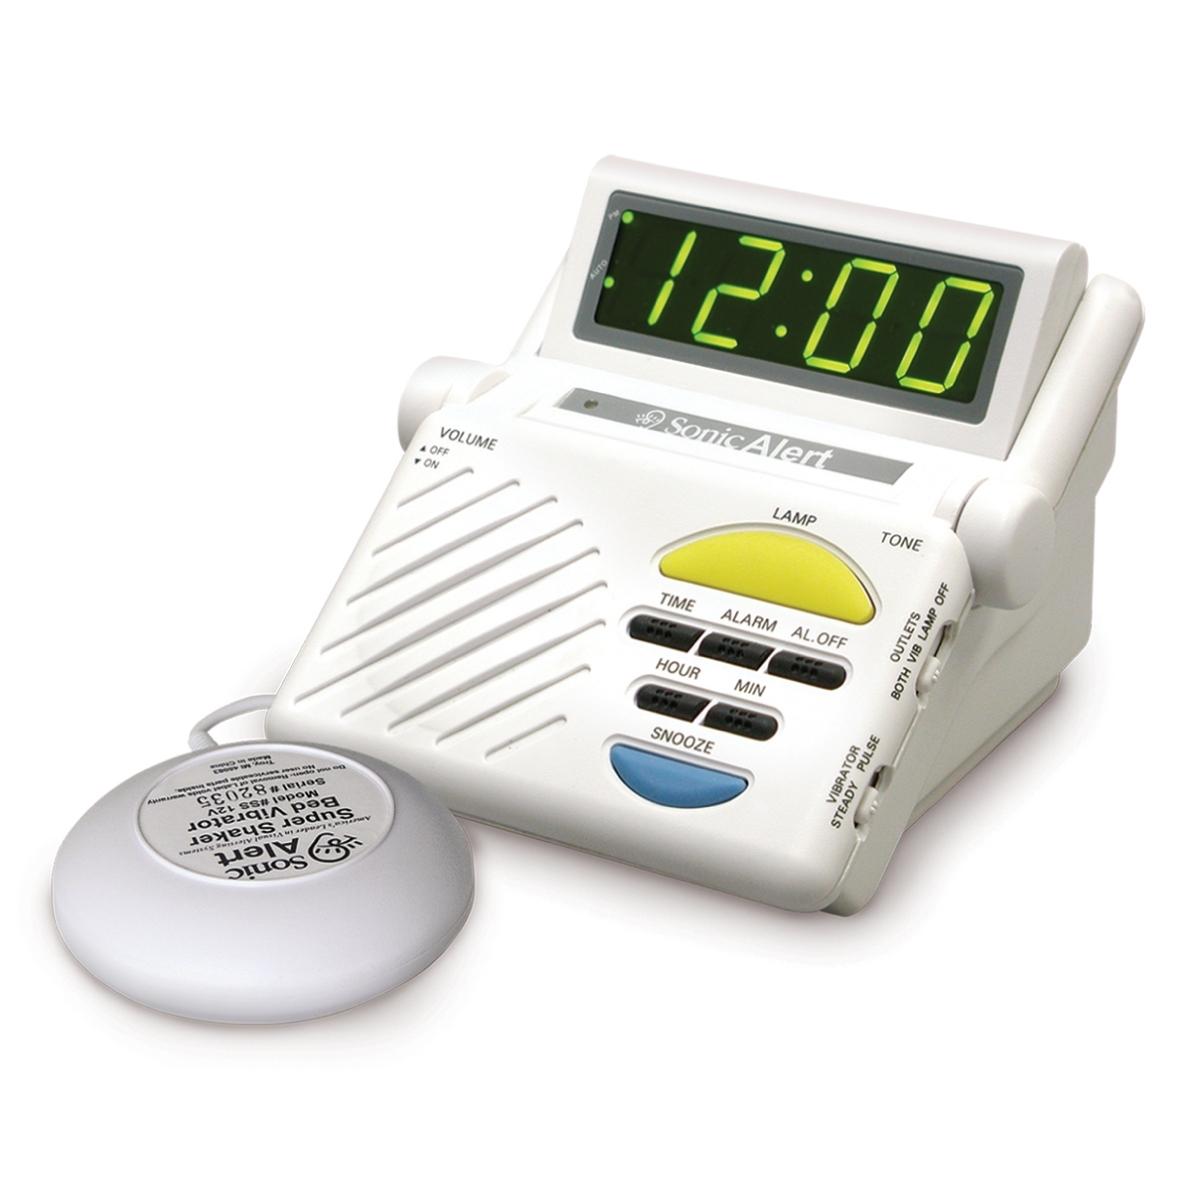 Sonic Boom Alarm Clock w/ Built in Receiver